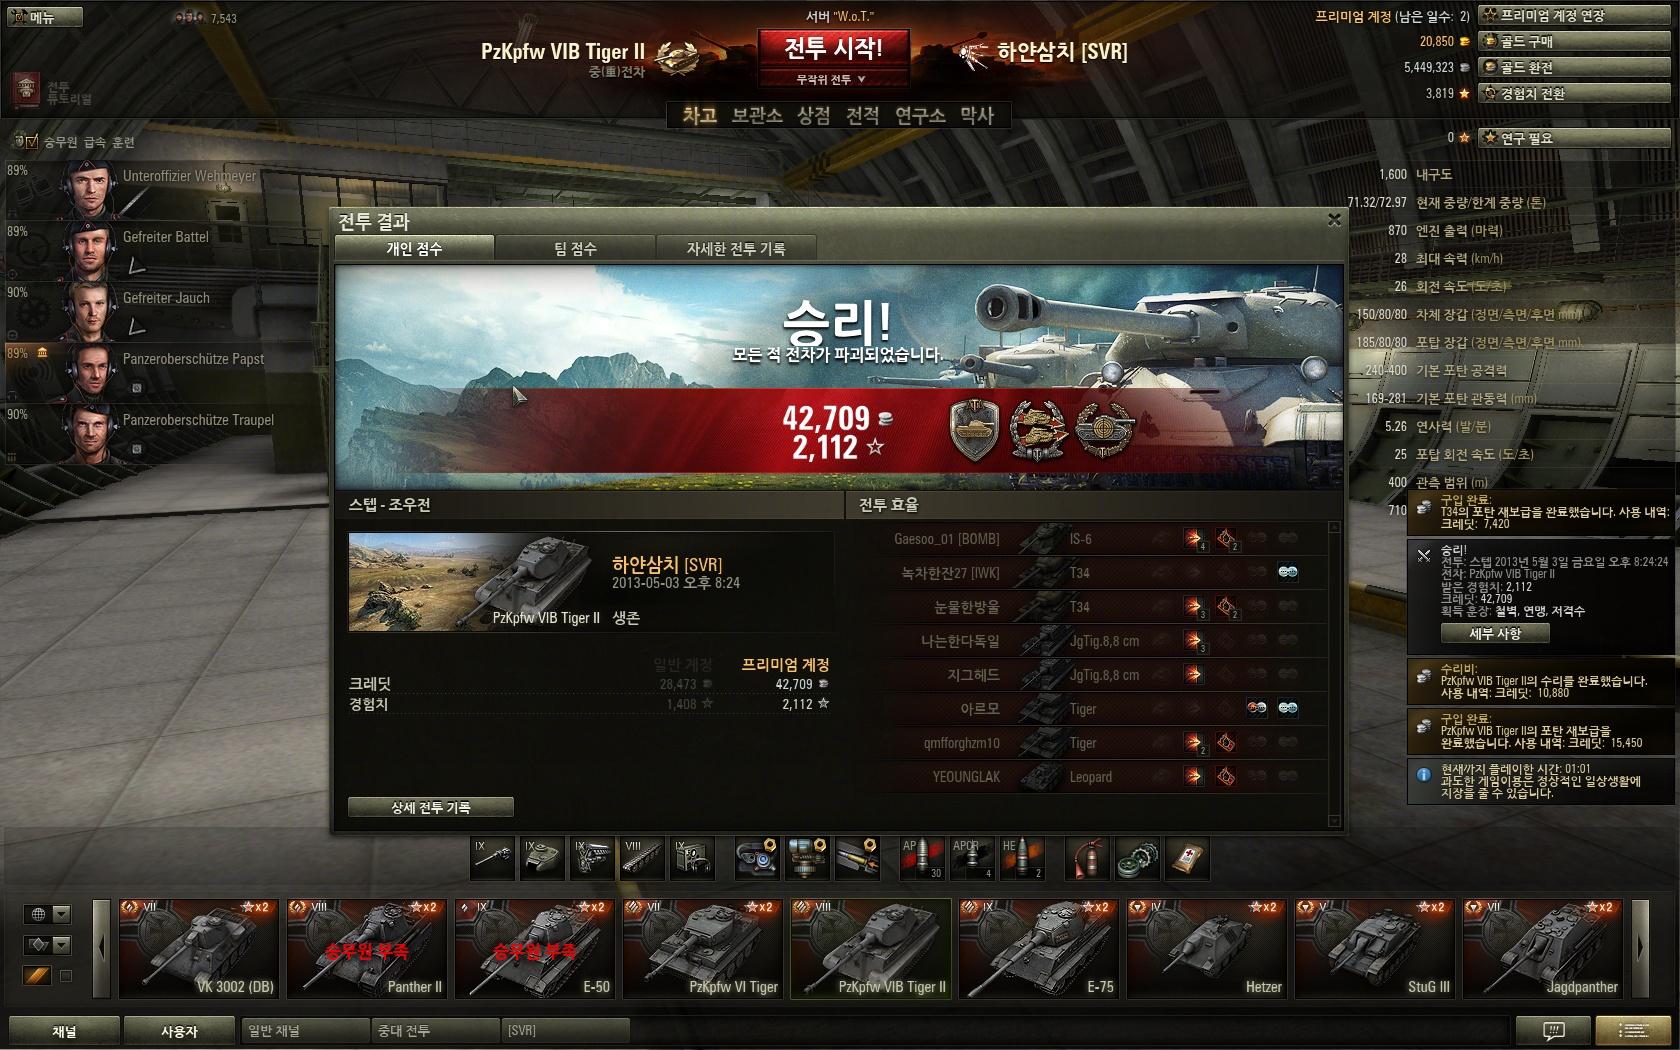 [WoT] 킹타이거는 역시 탱커임다.